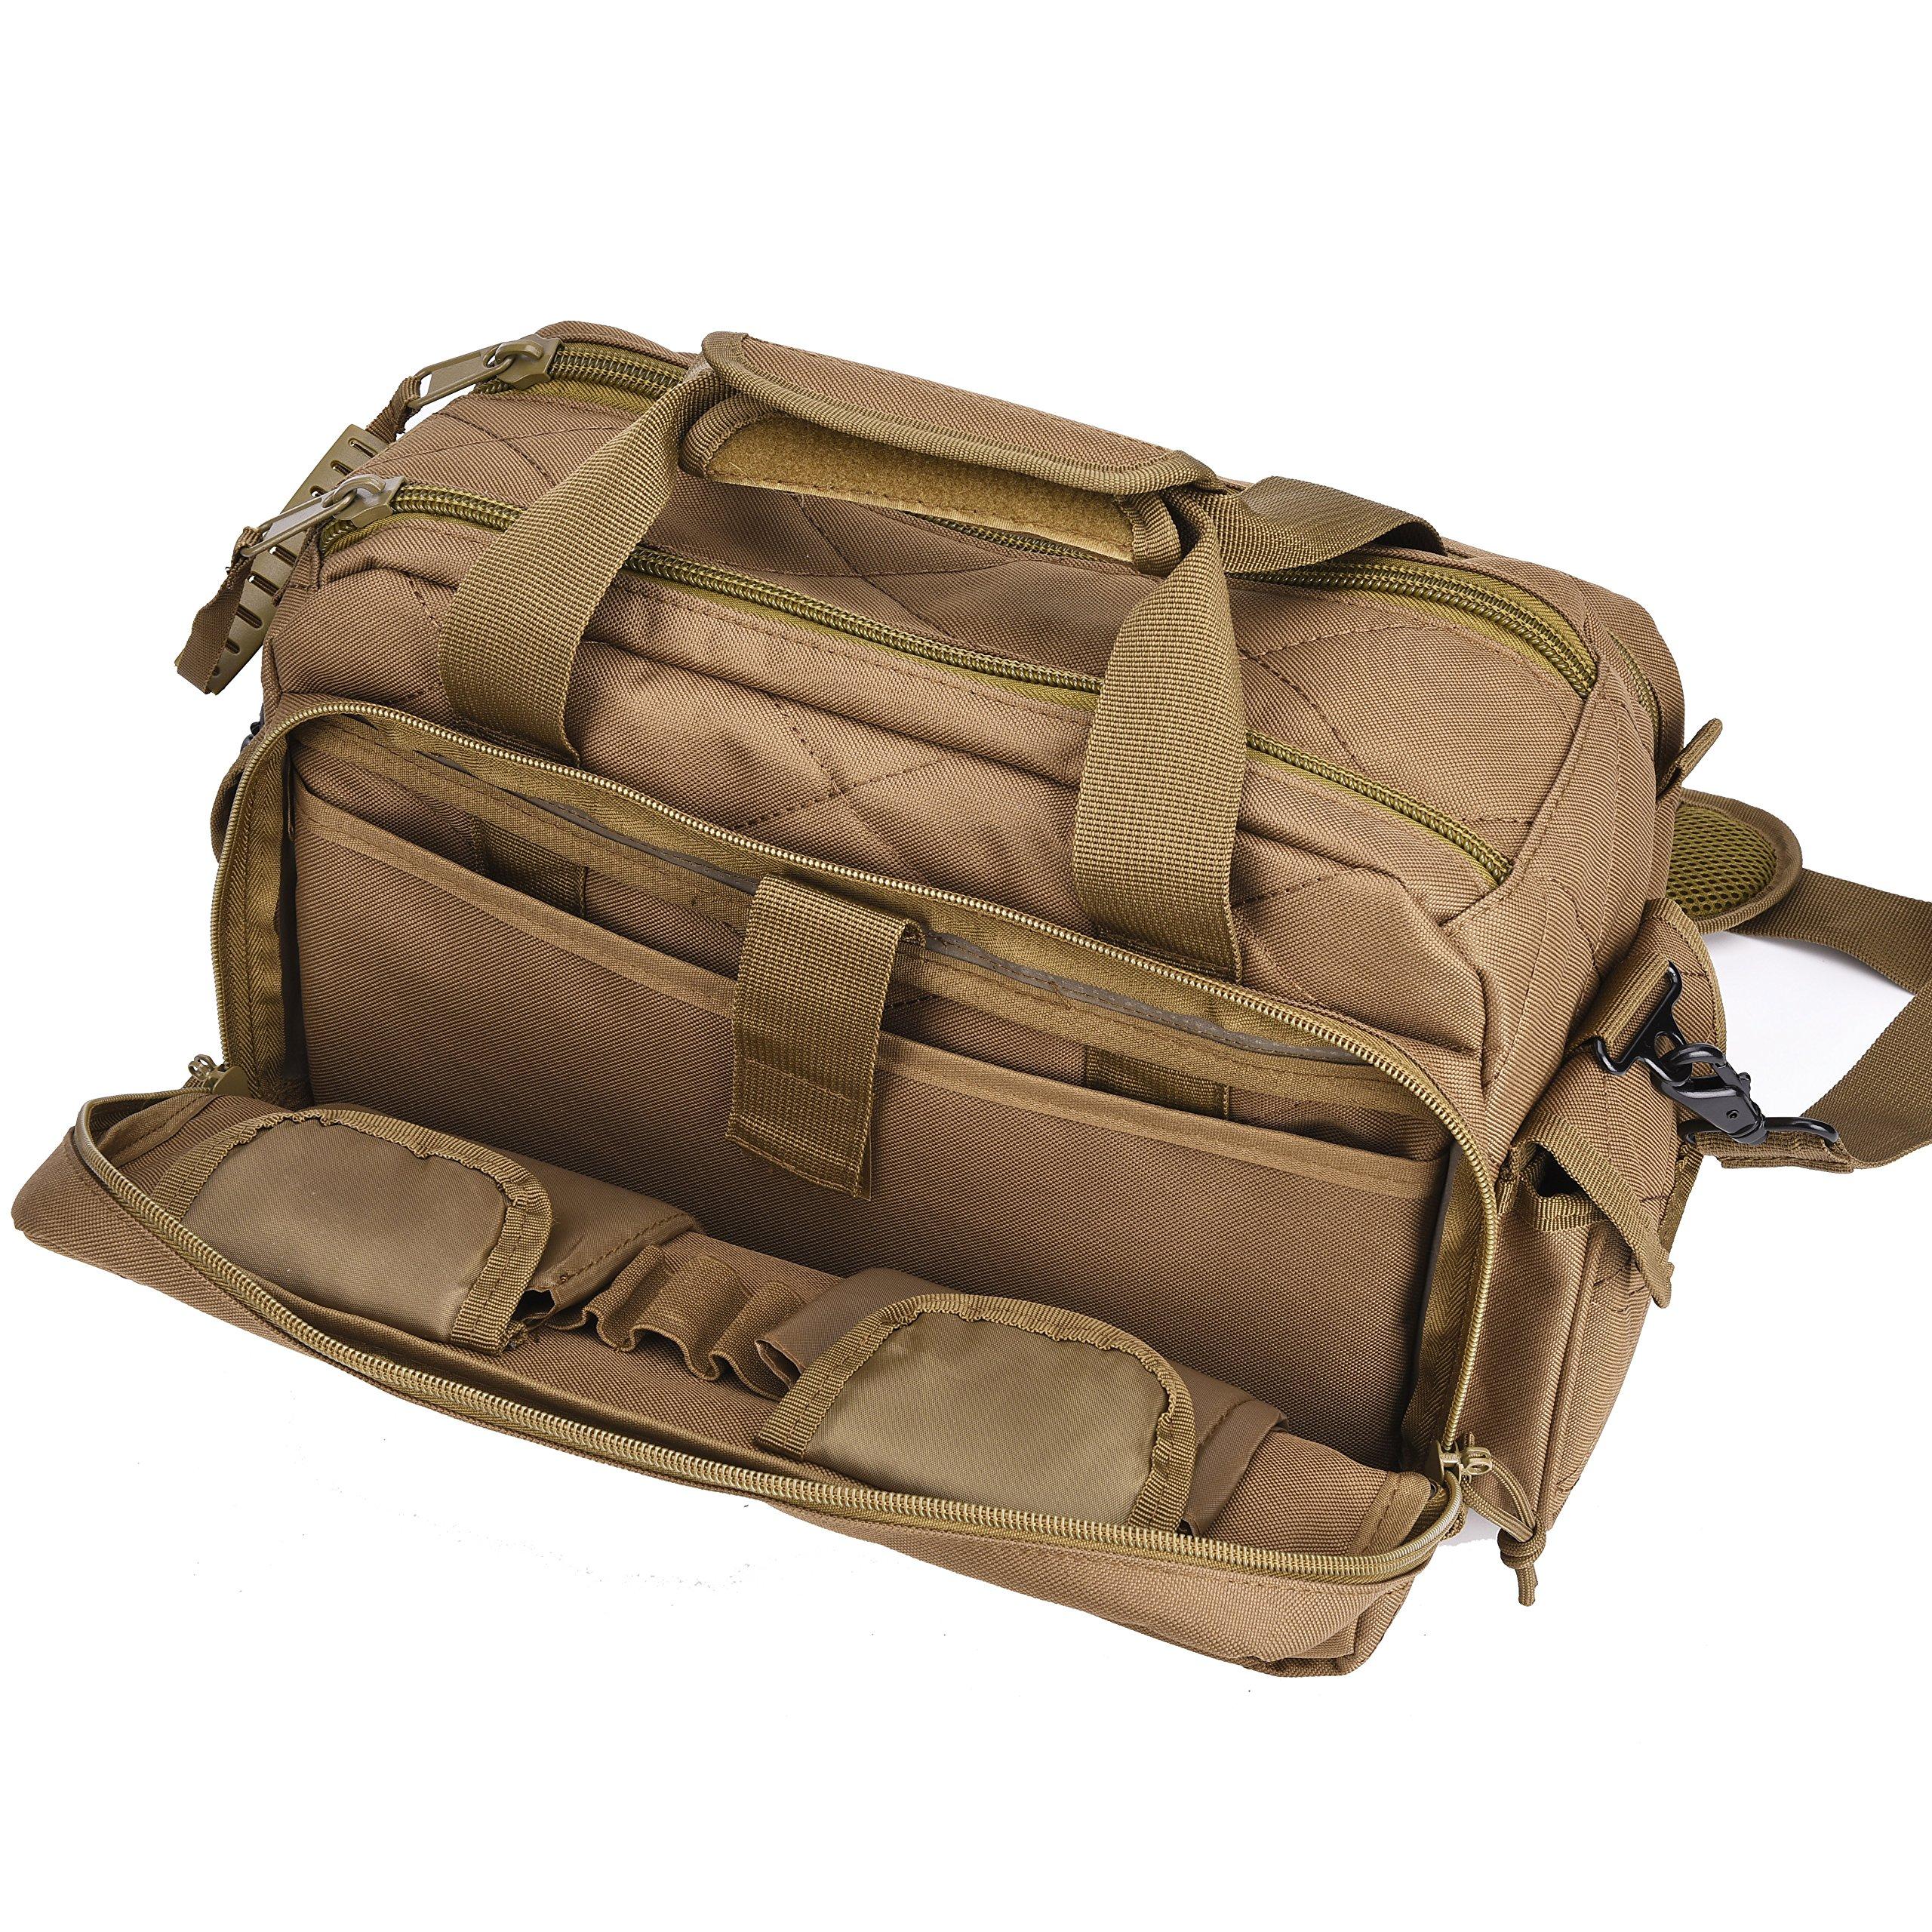 REEBOW TACTICAL Tactical Gun Range Bag Deluxe Pistol Shooting Range Duffle Bags Black by REEBOW TACTICAL (Image #4)